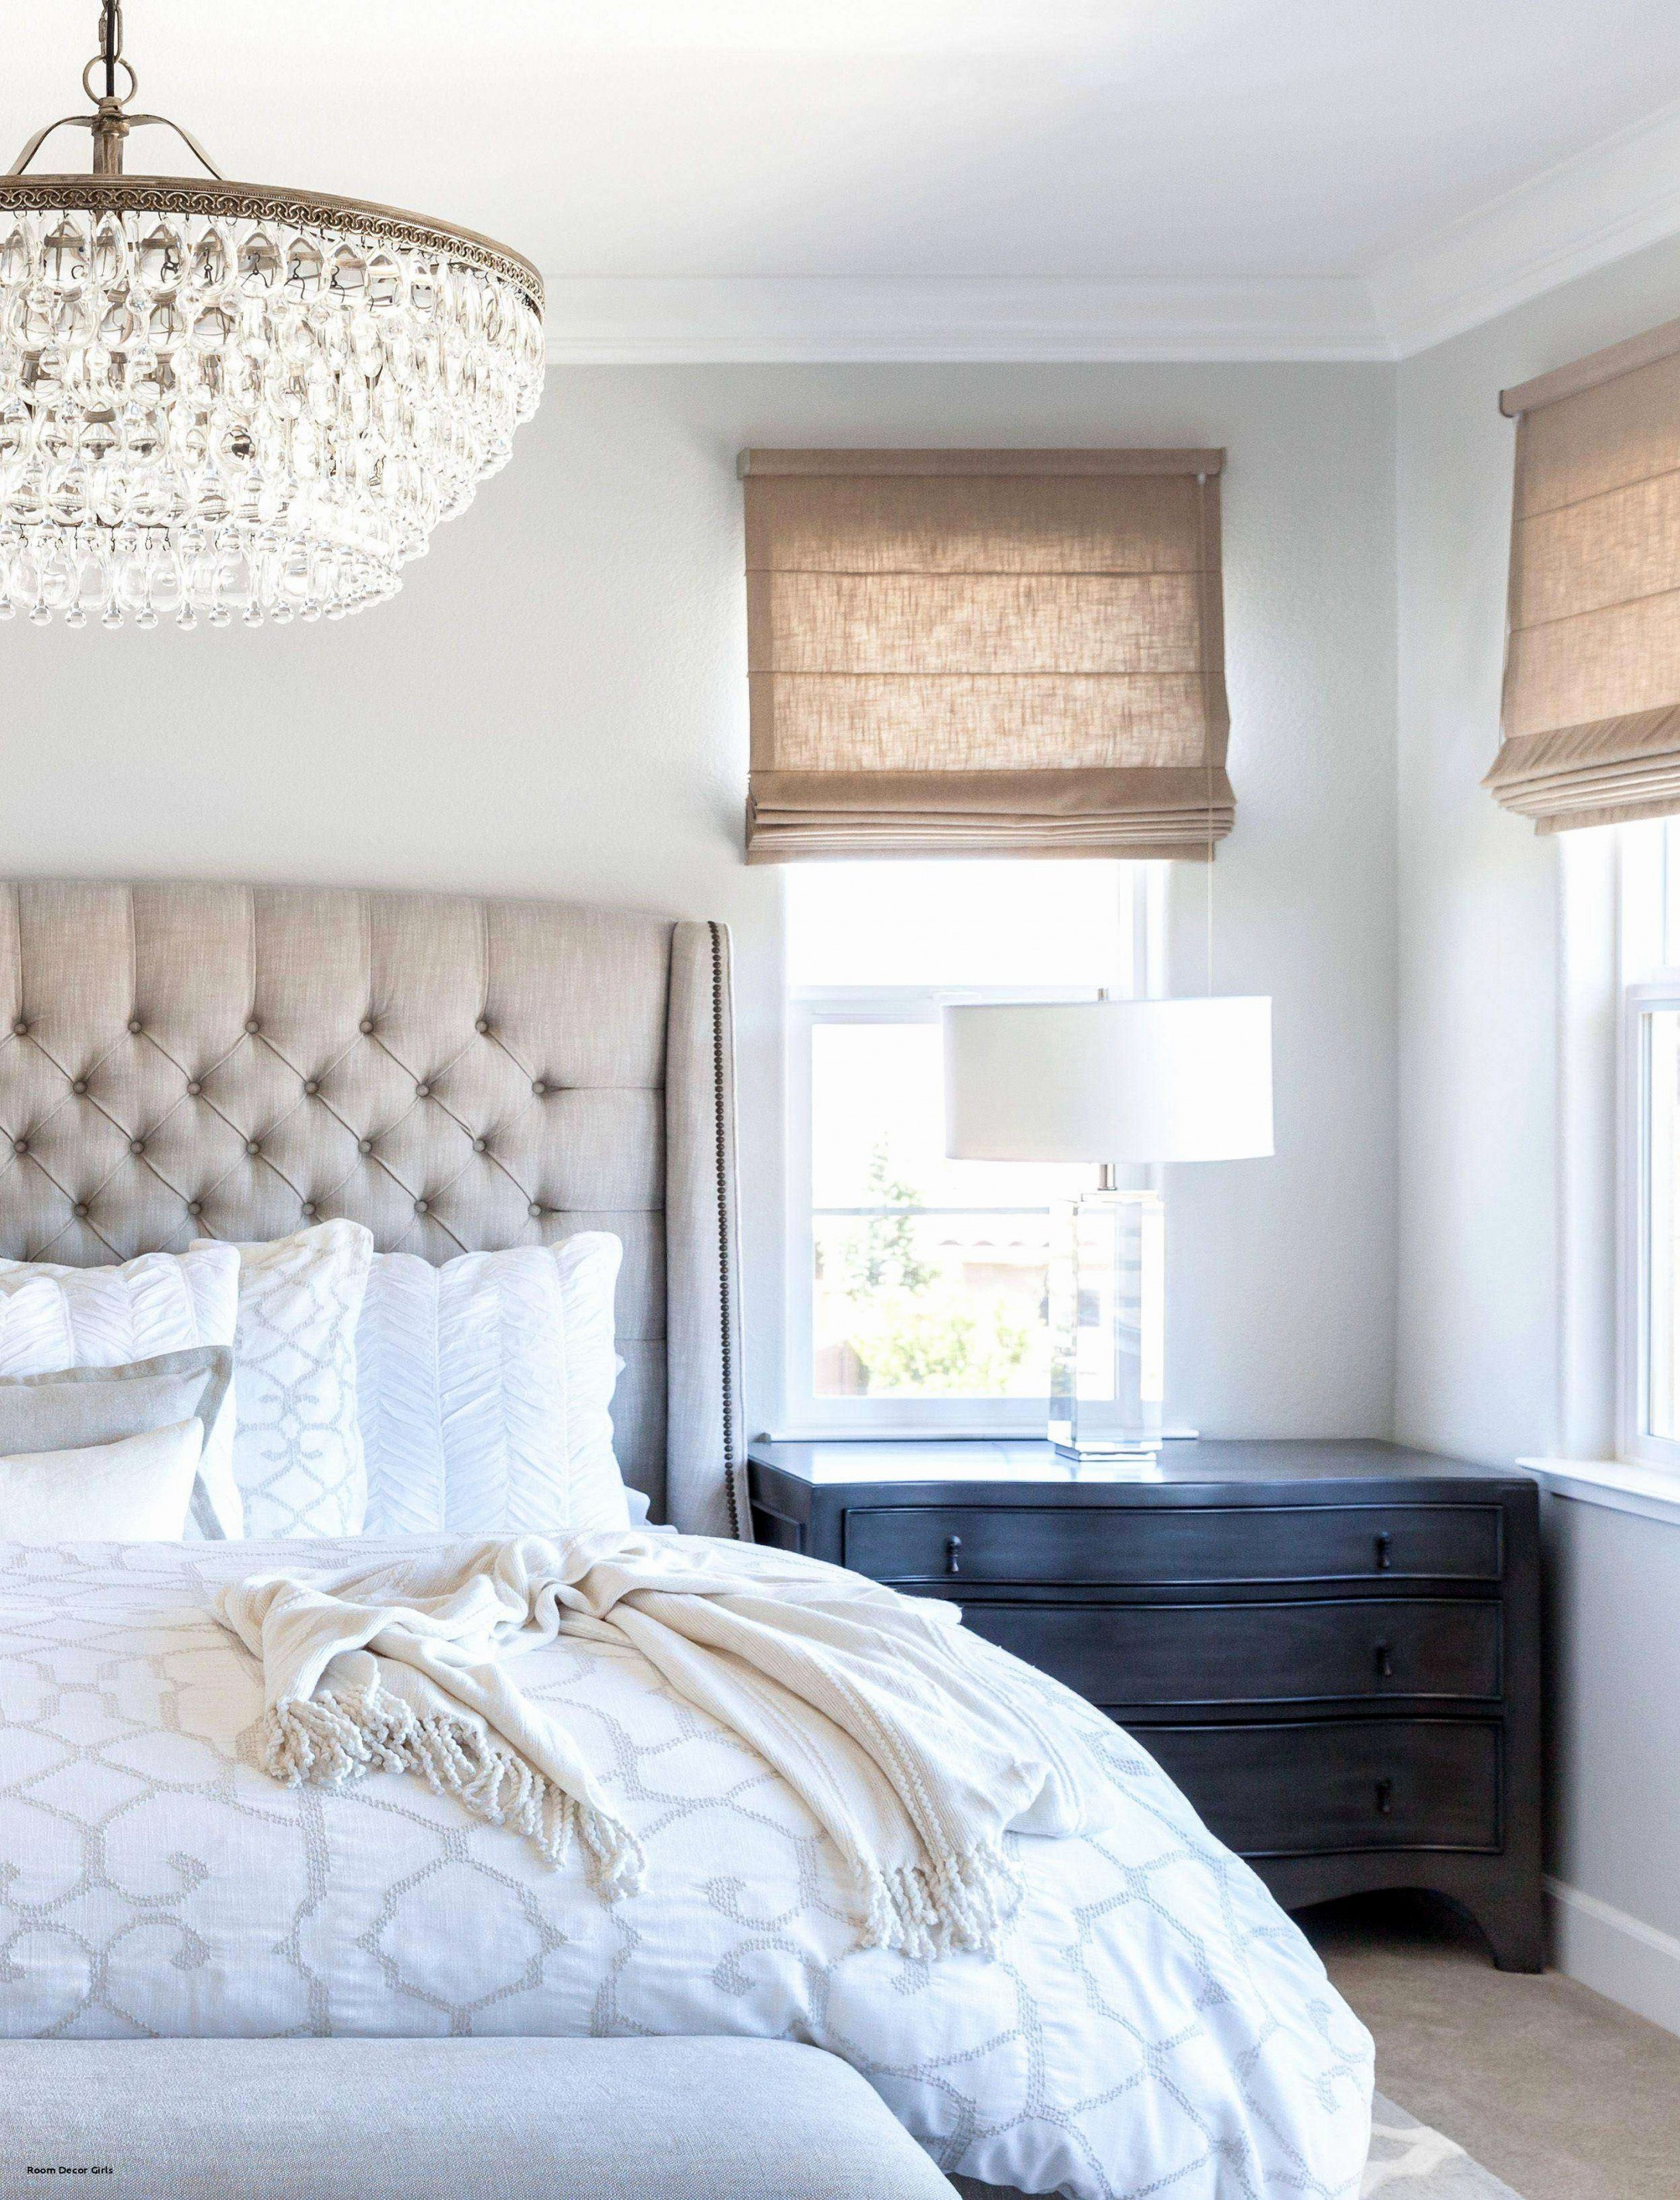 Girl Bedroom Set Full Fresh Bedrooms for Girls 48 Awesome Bedroom Ideas for La S Home